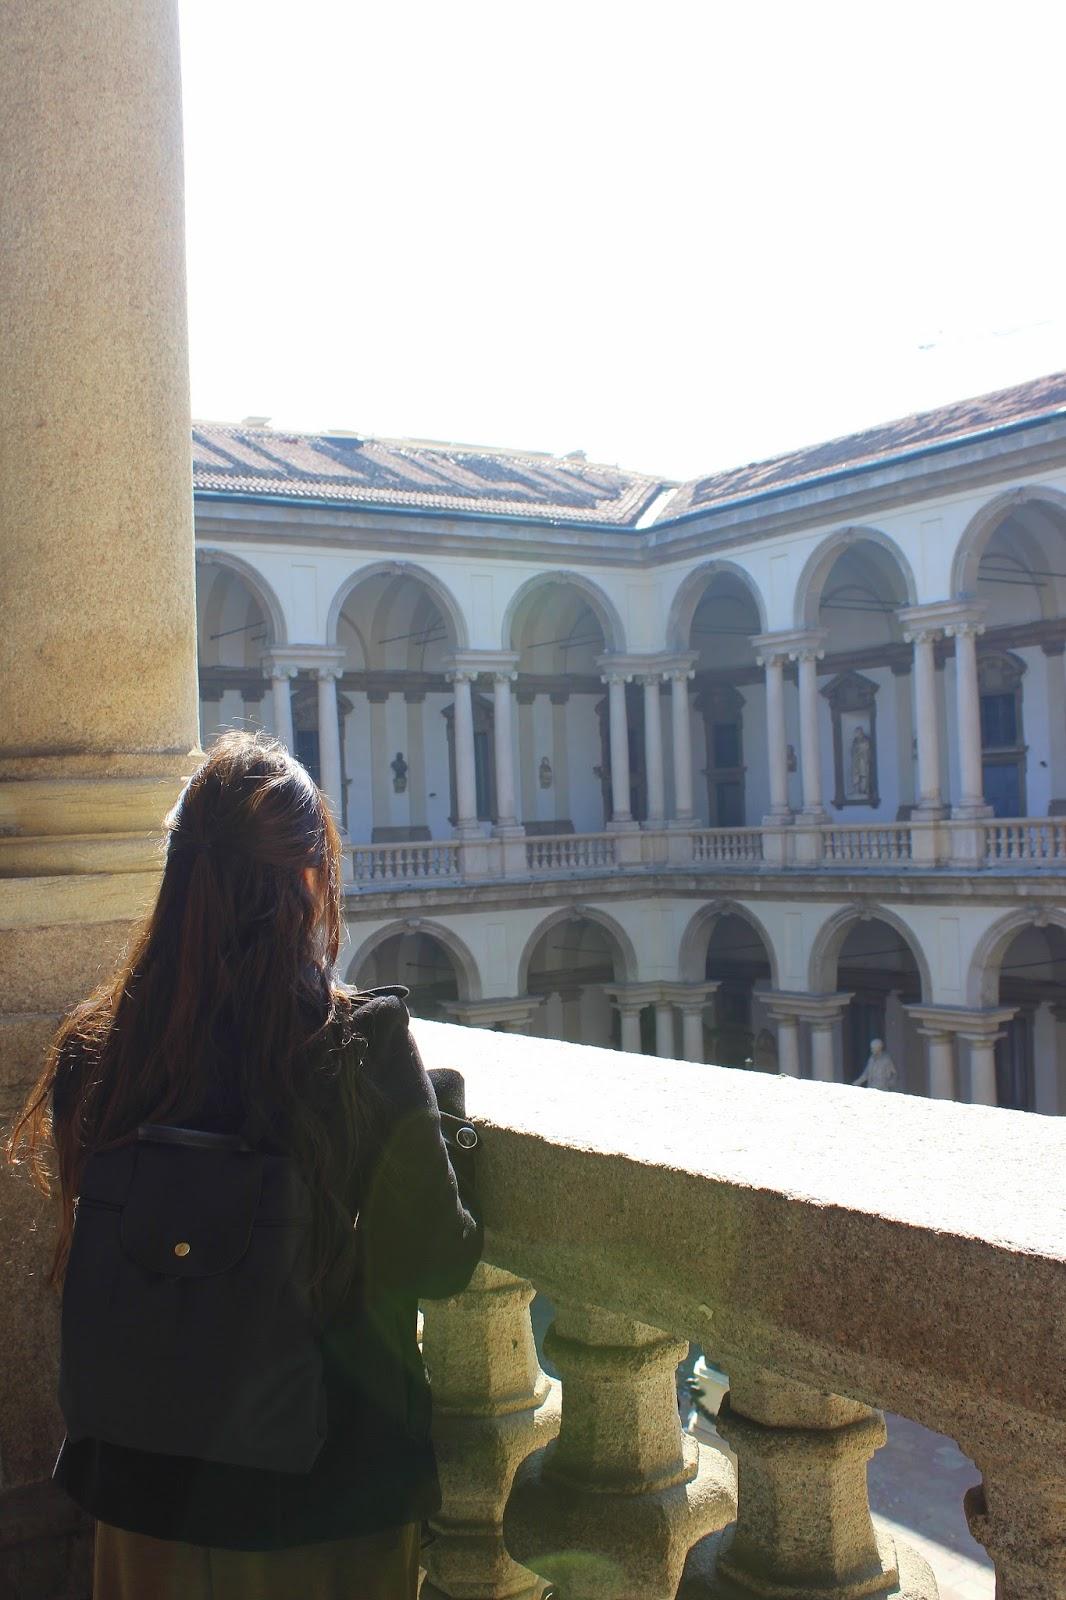 Tagesausflug Mailand tipps